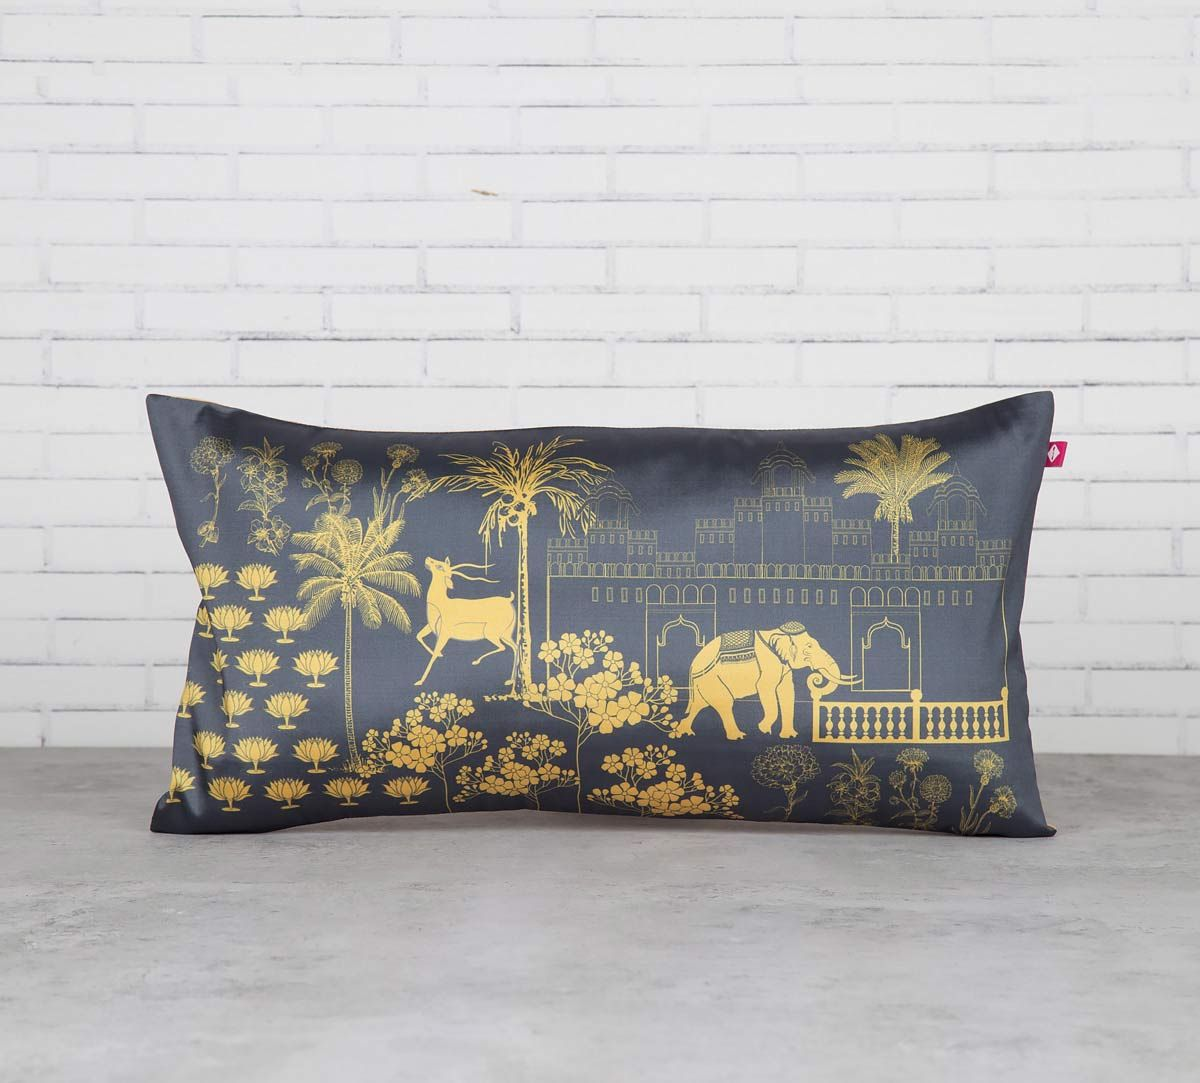 India Circus Palatial Courtyard Blended Taf Silk Cushion Cover